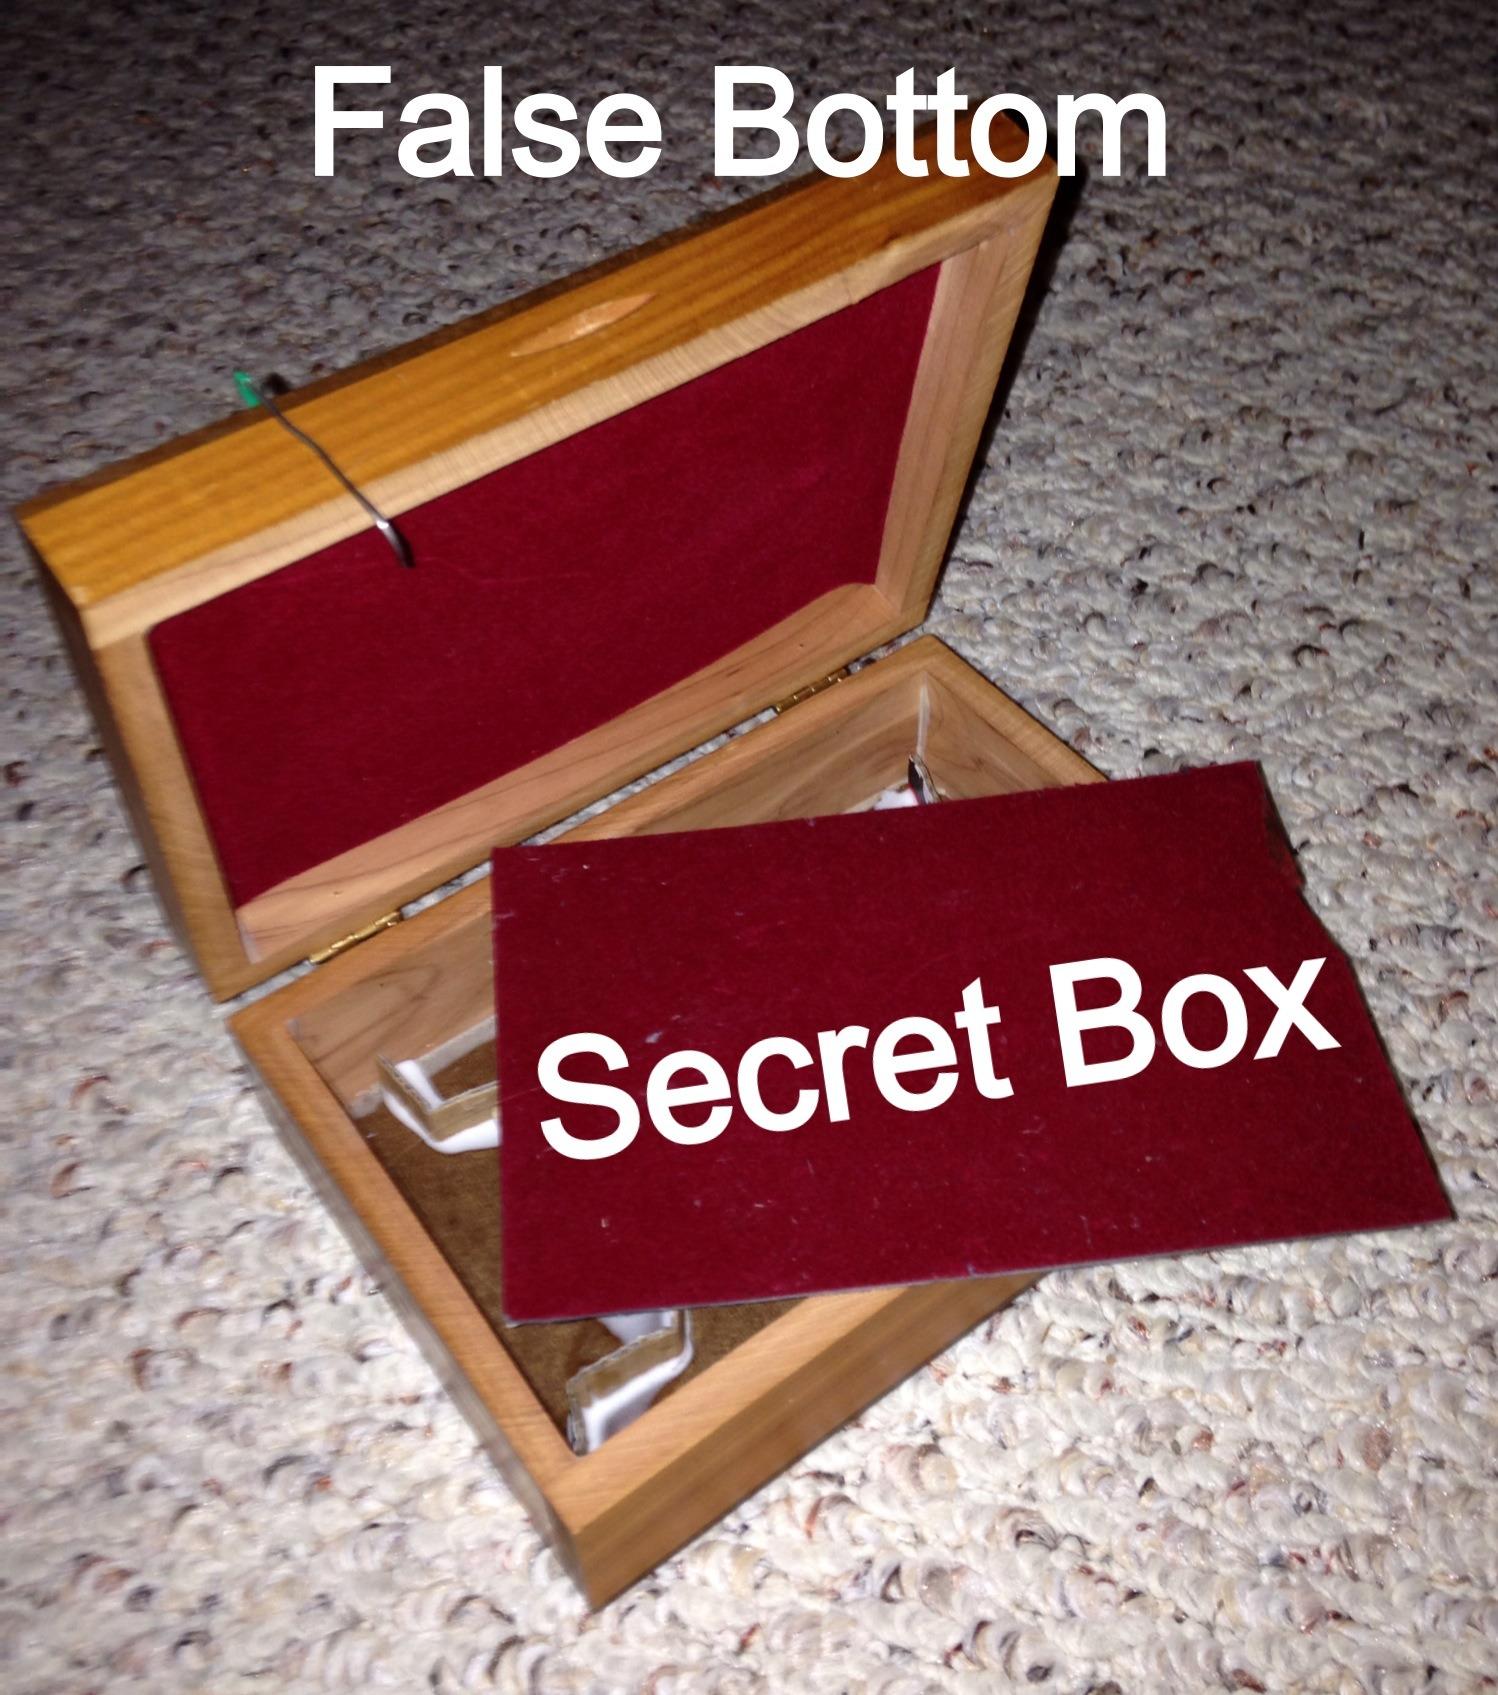 Jewelry Box With False Bottom